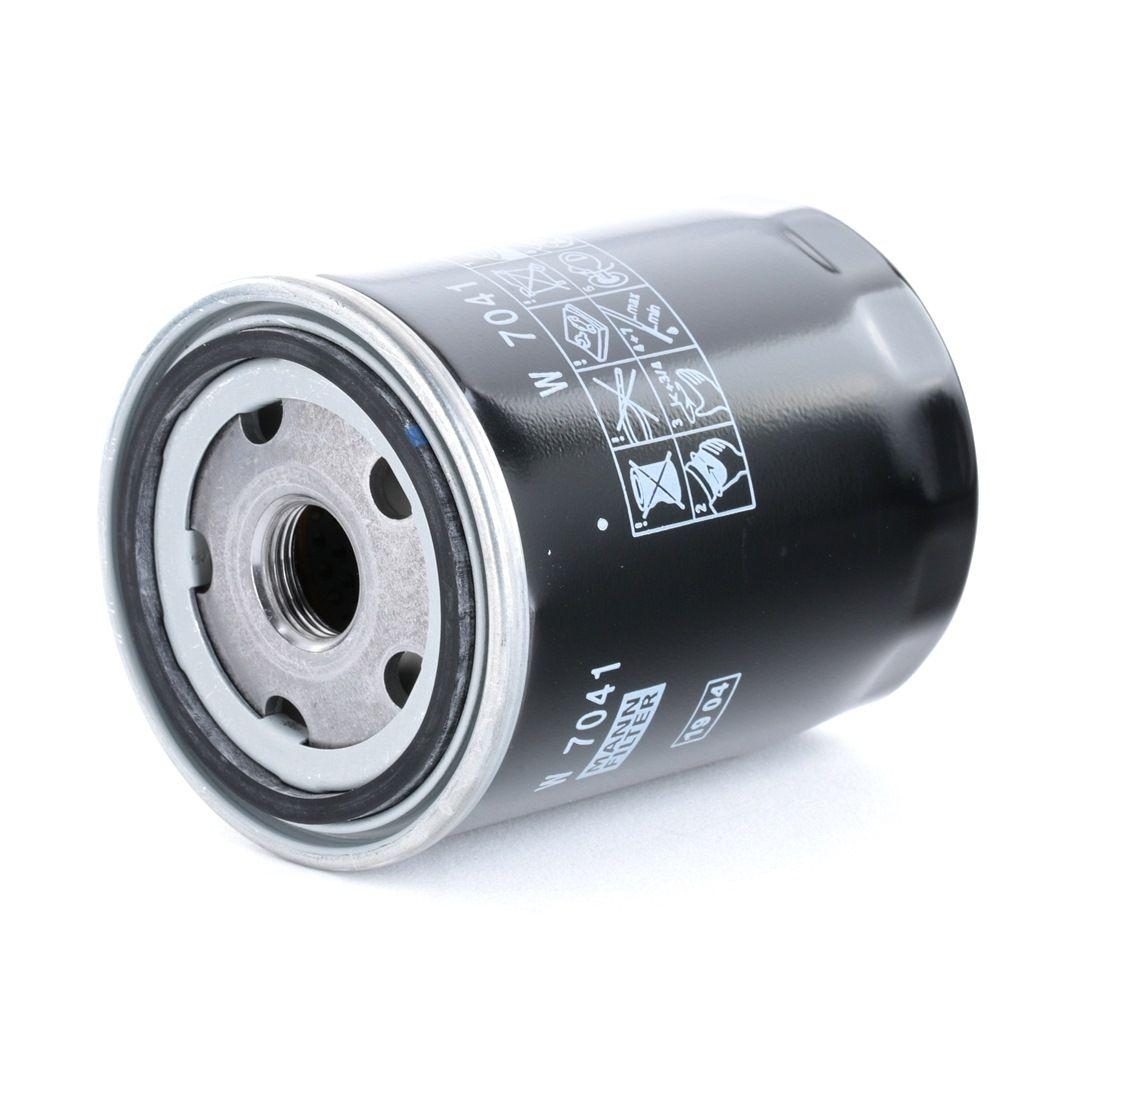 MANN-FILTER: Original Ölfilter W 7041 (Innendurchmesser 2: 57mm, Innendurchmesser 2: 57mm, Ø: 78mm, Außendurchmesser 2: 65mm, Höhe: 100mm)